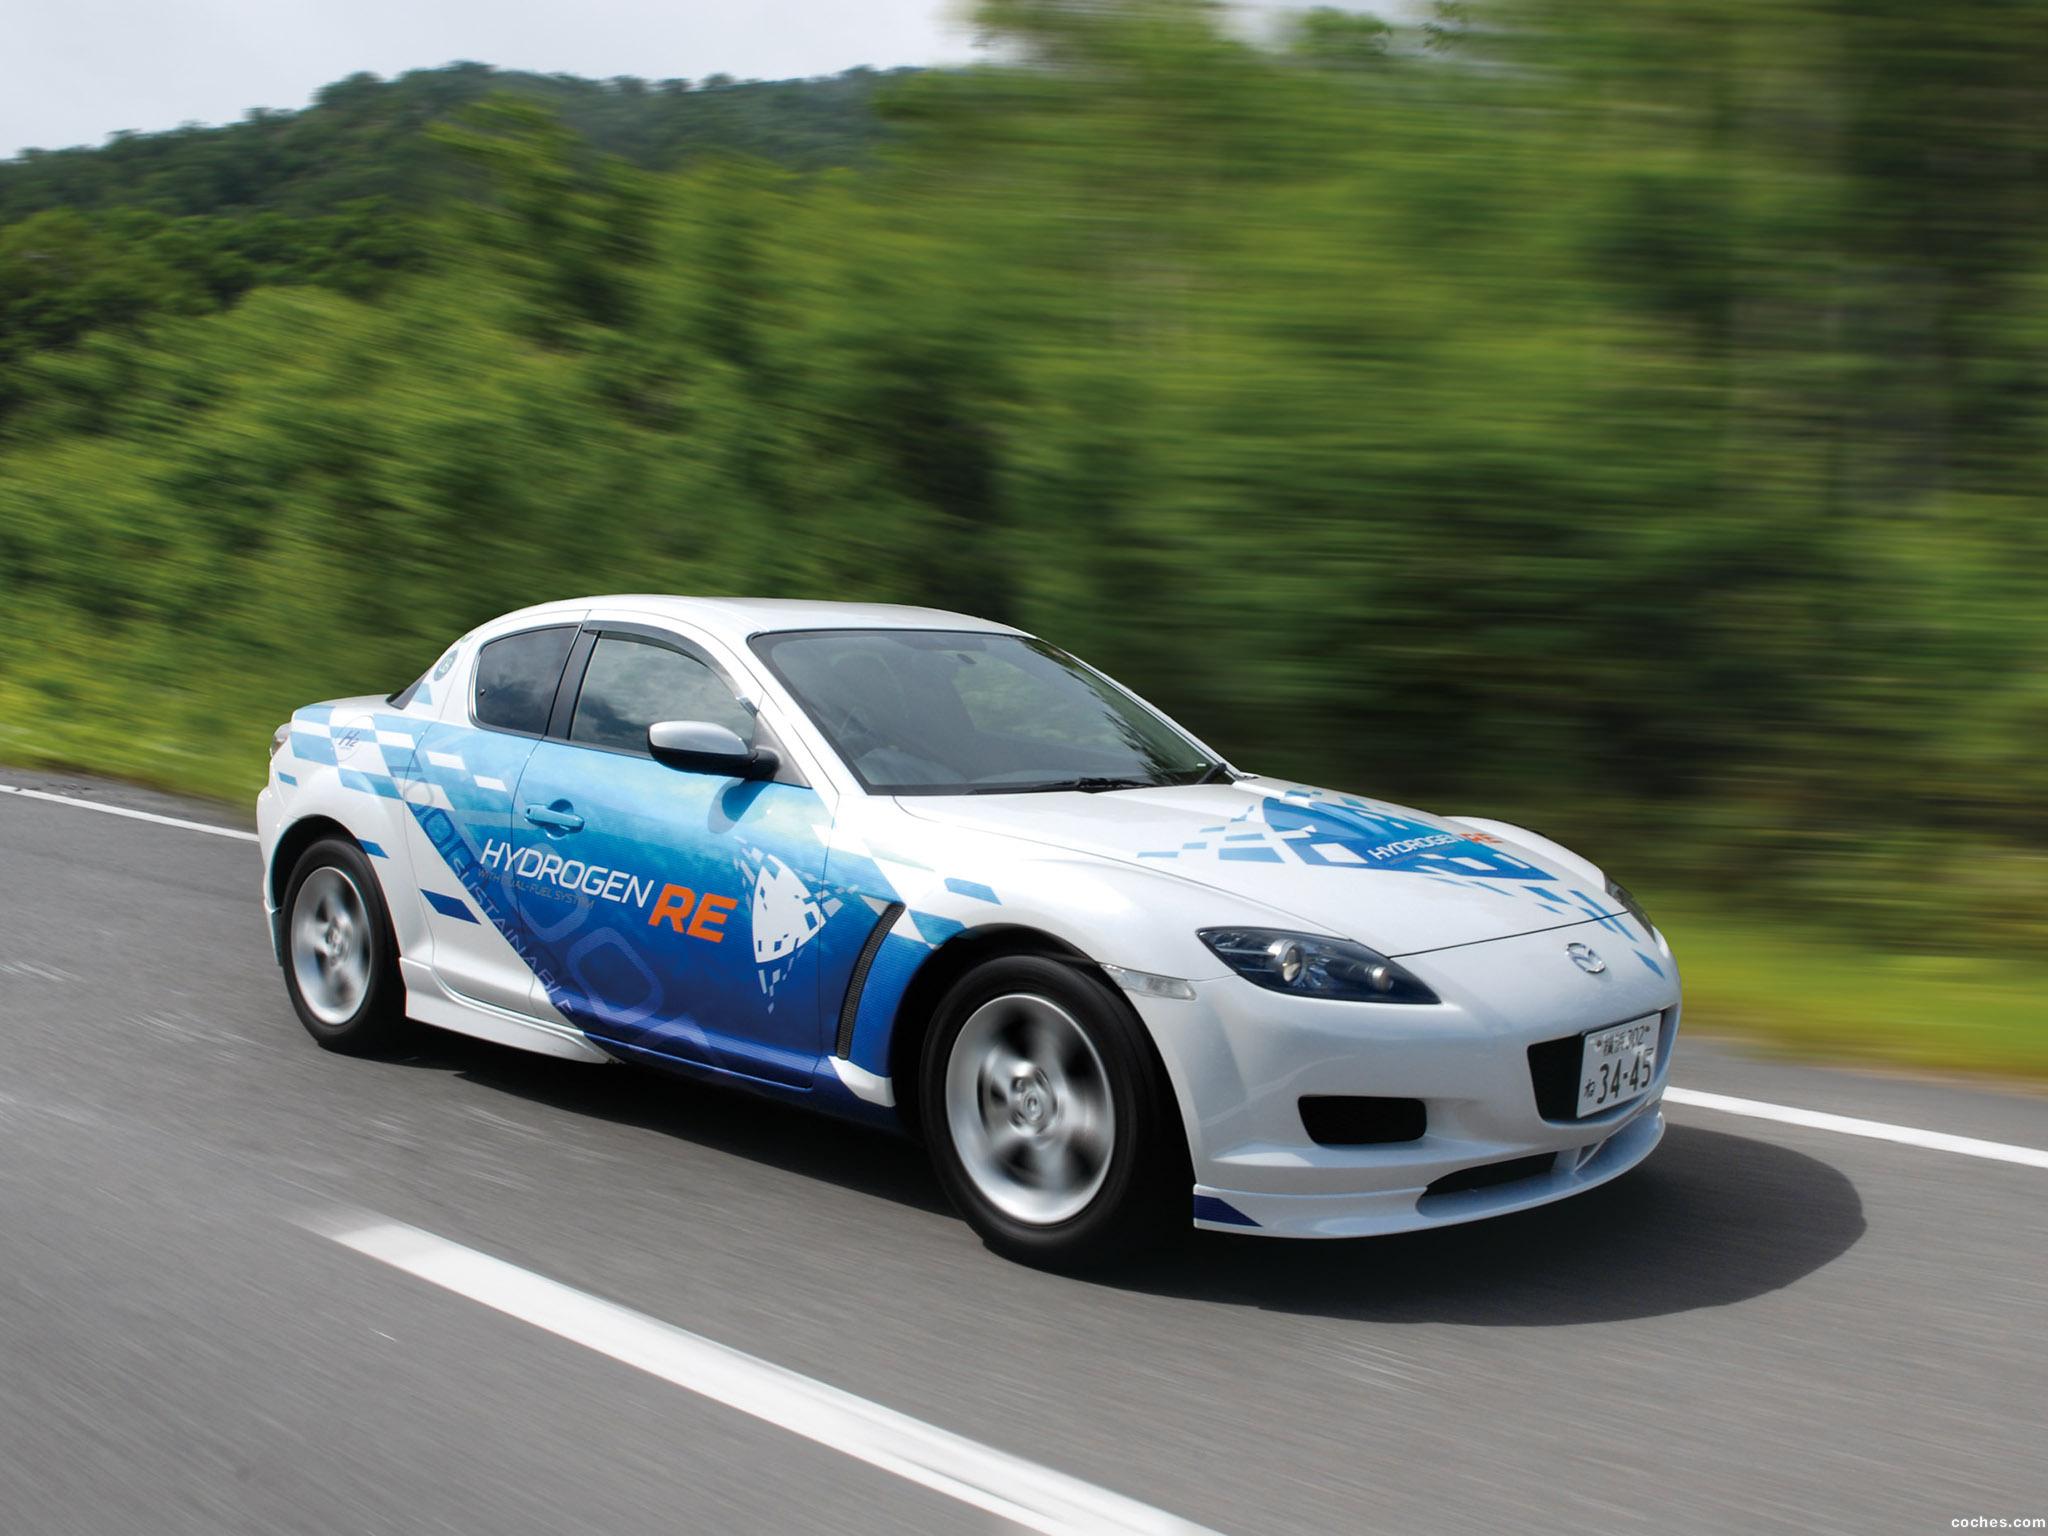 Foto 11 de Mazda RX-8 Hydrogen Re Dual Fuel System 2009